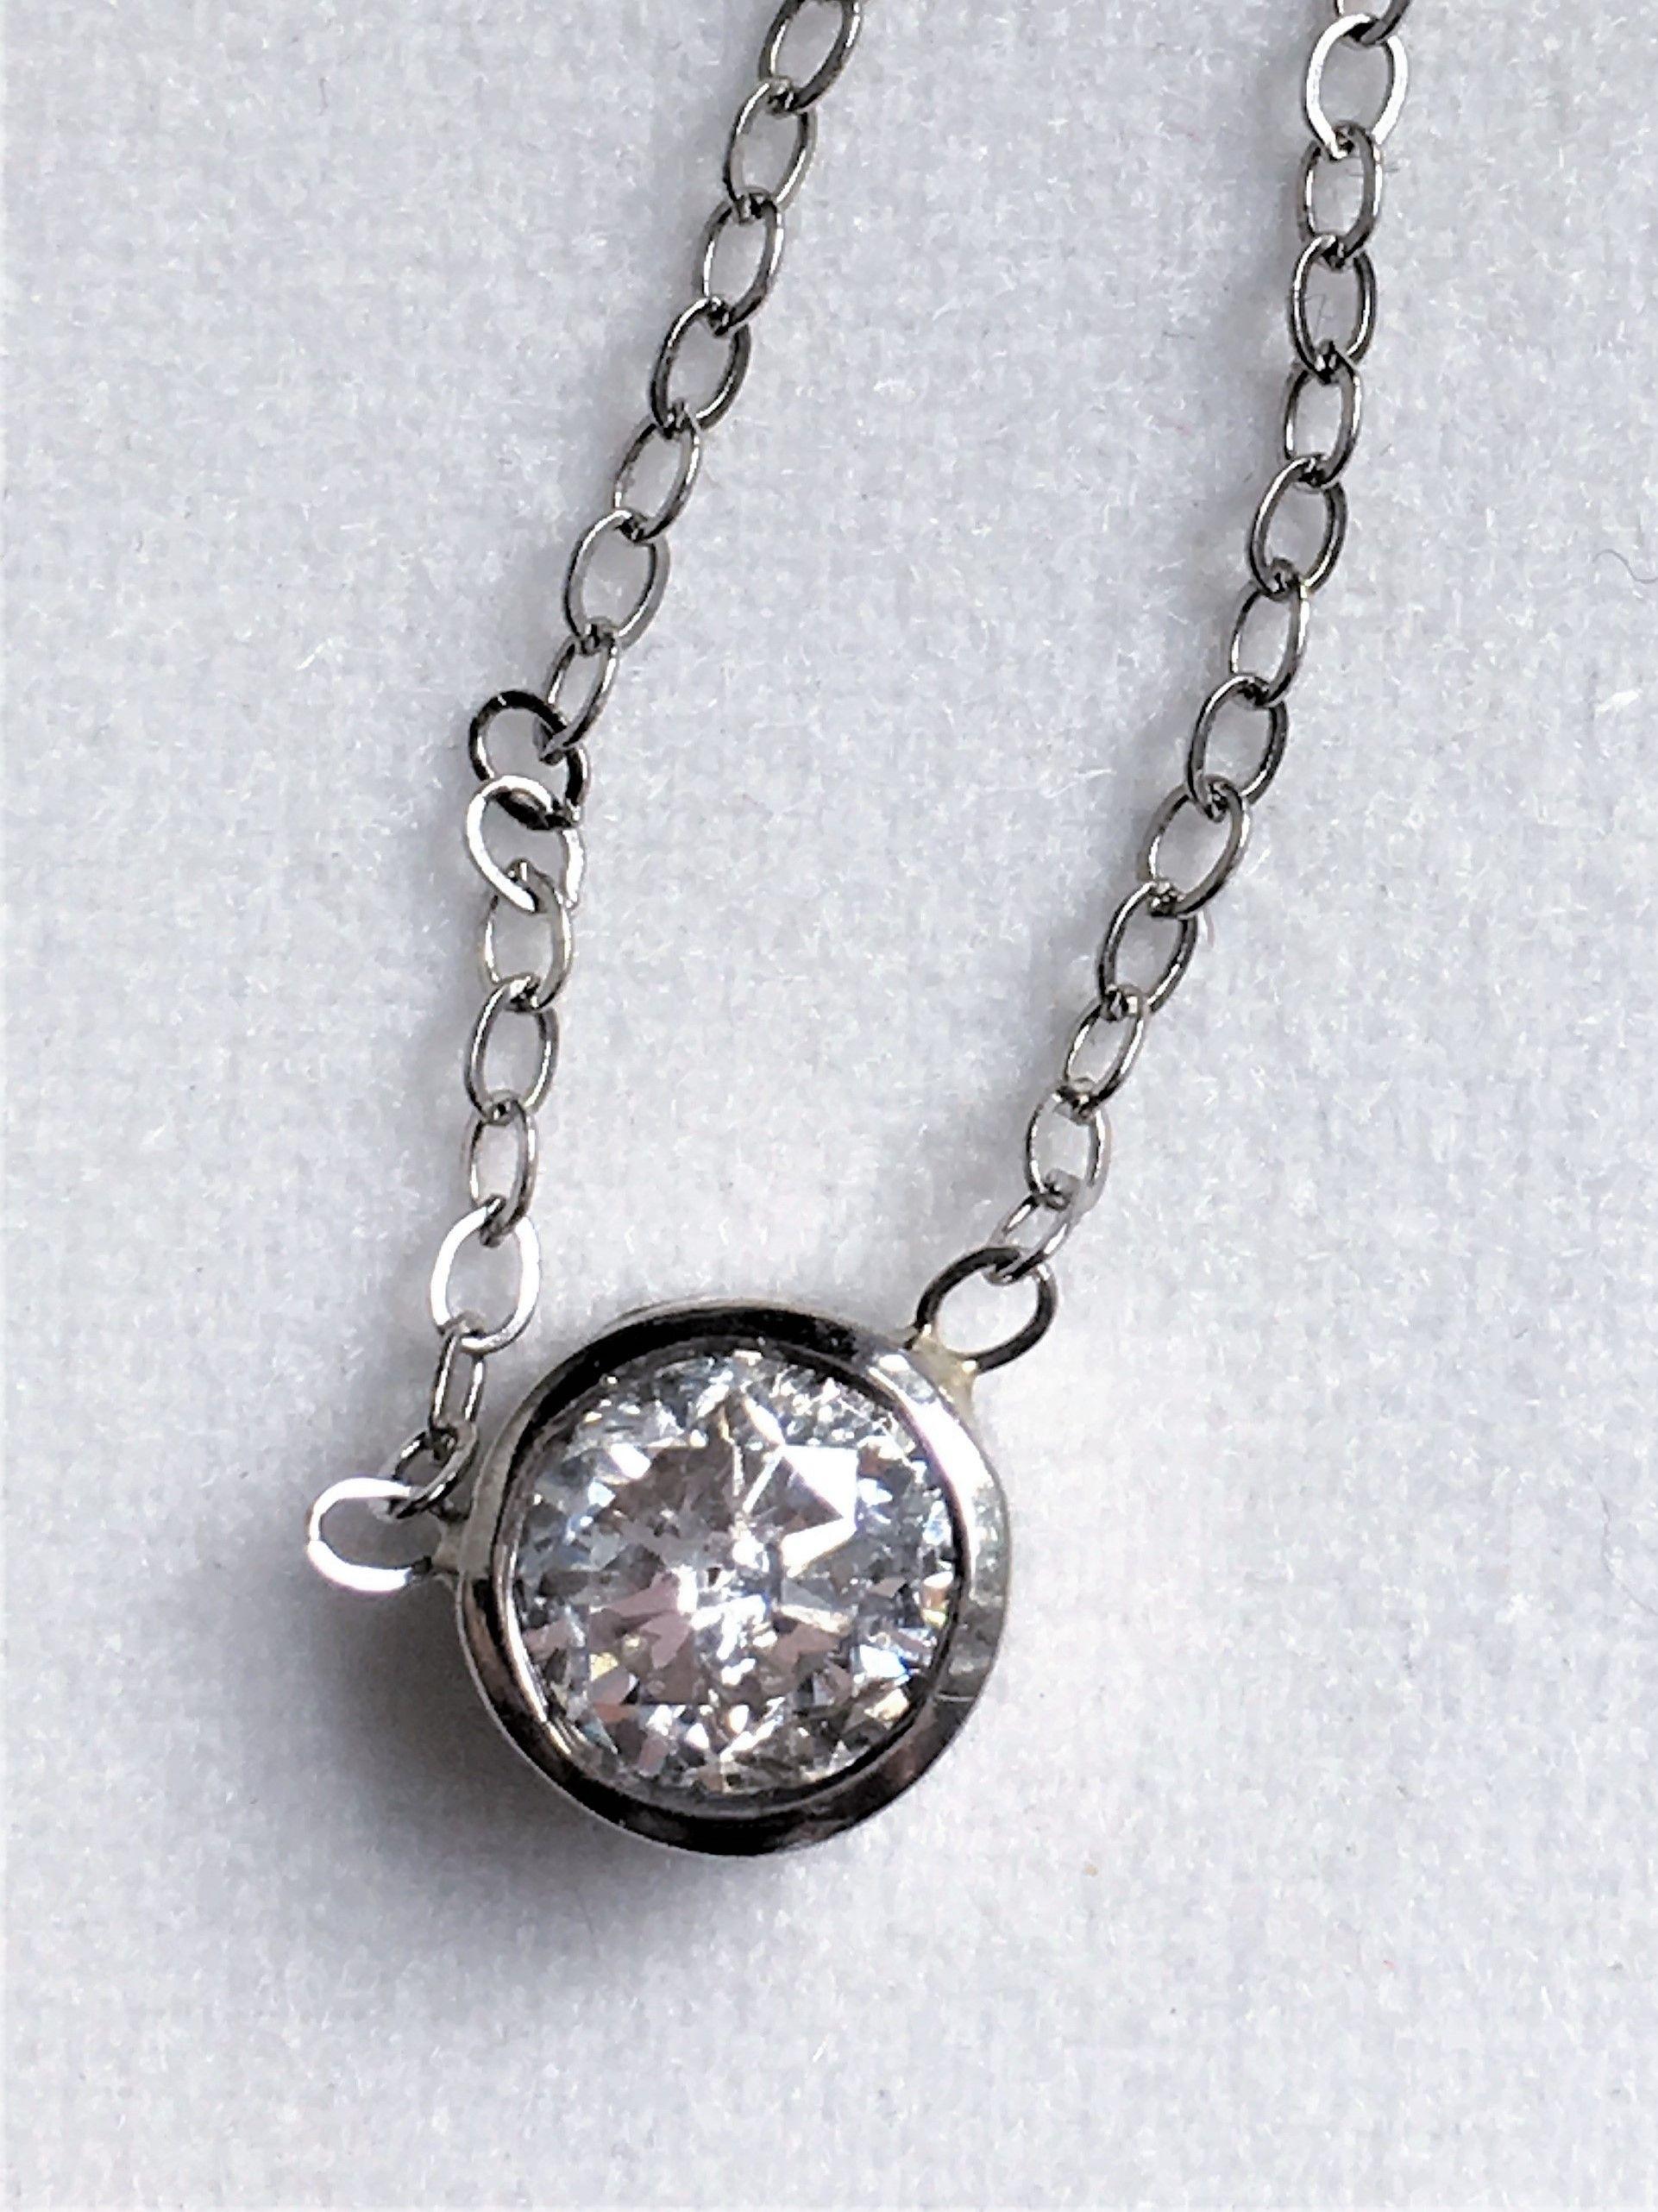 White gold bezel set diamond pendant on a